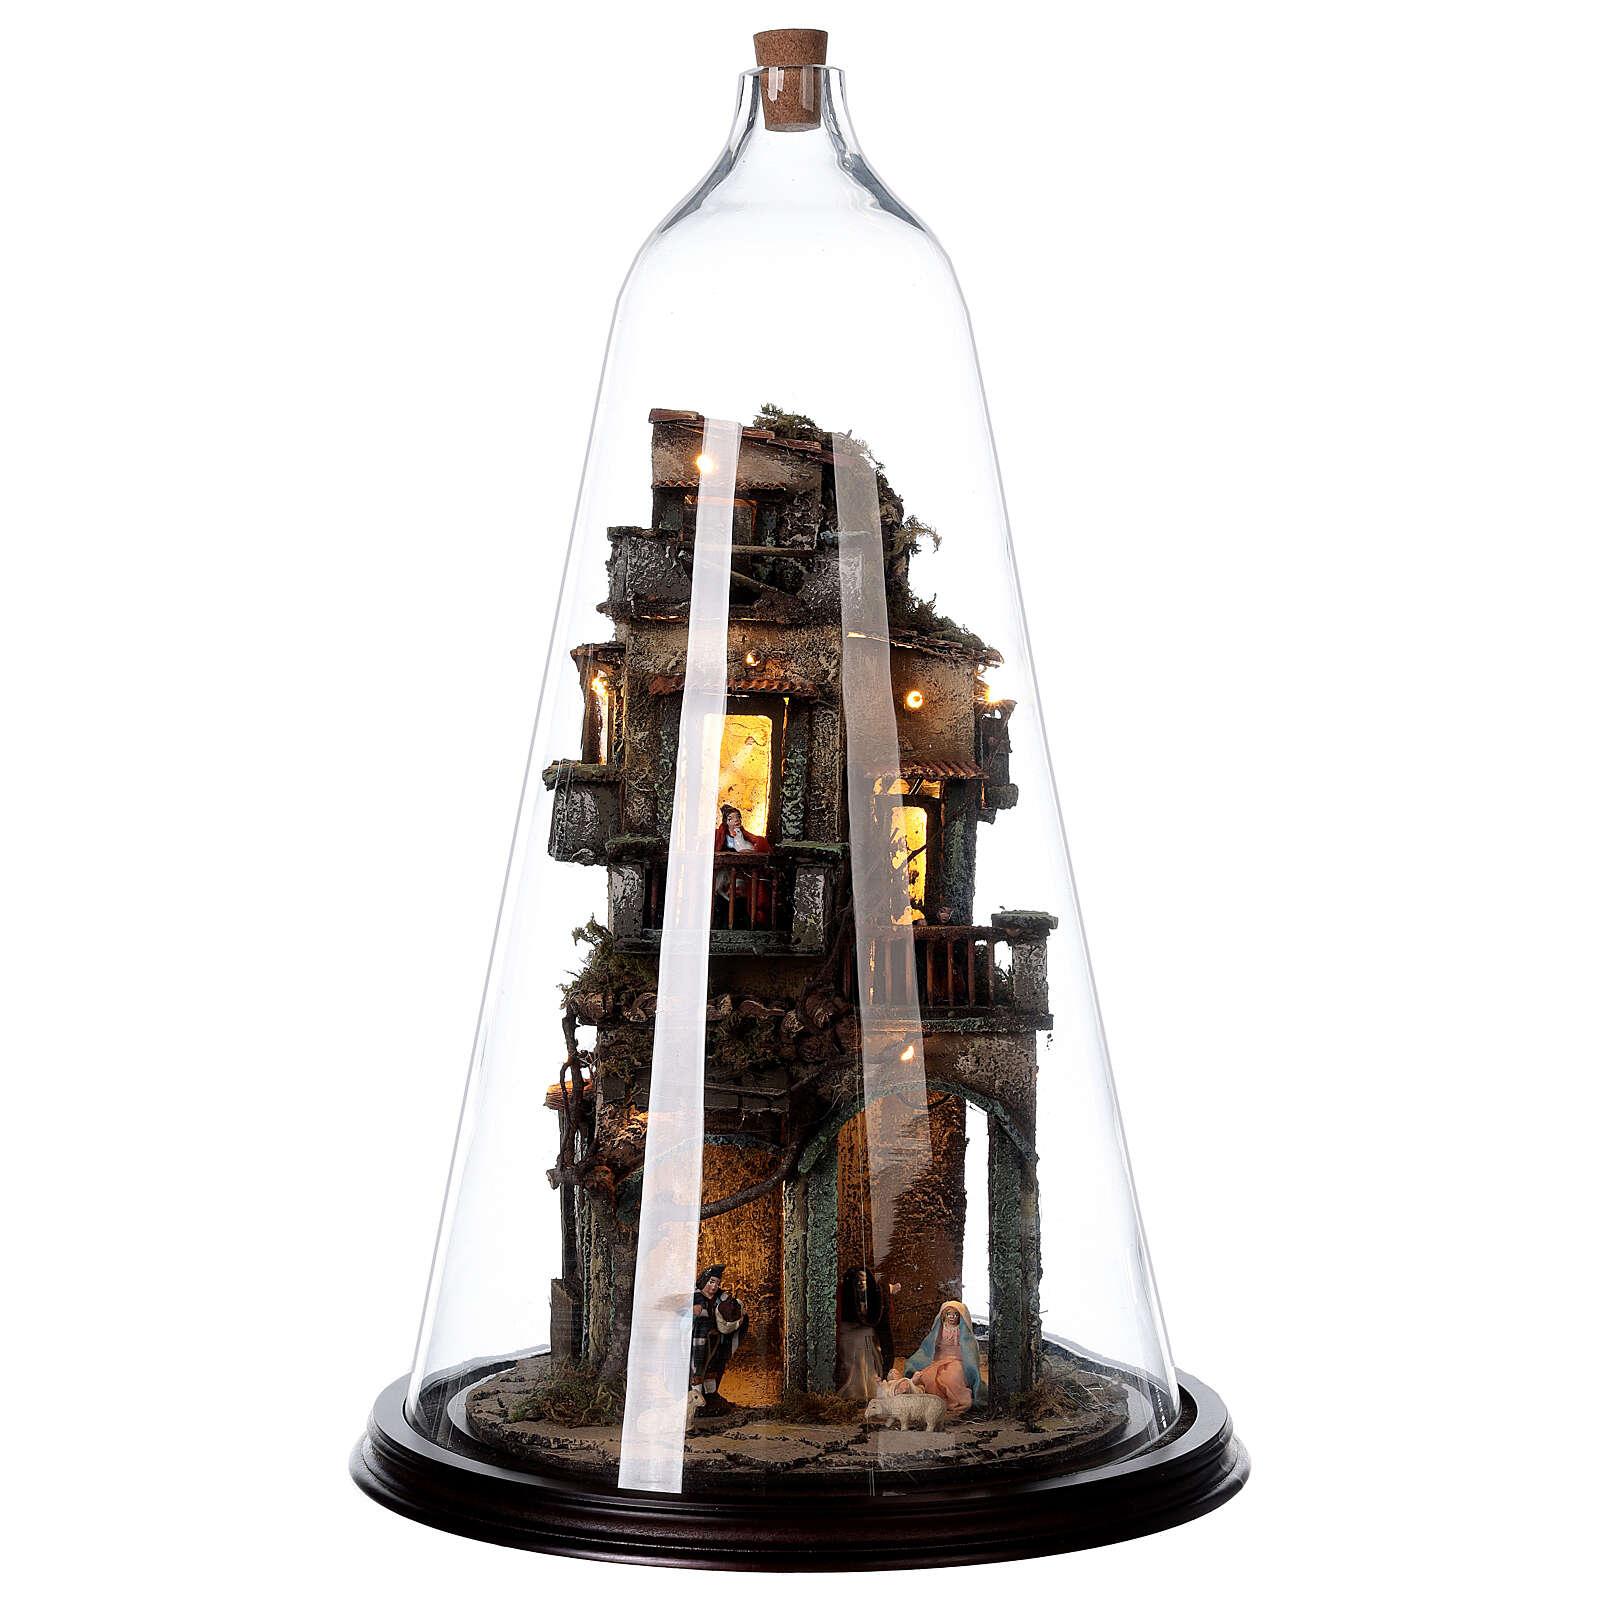 Presepe campana vetro bottiglia presepe napoletano illuminato 50x30 4